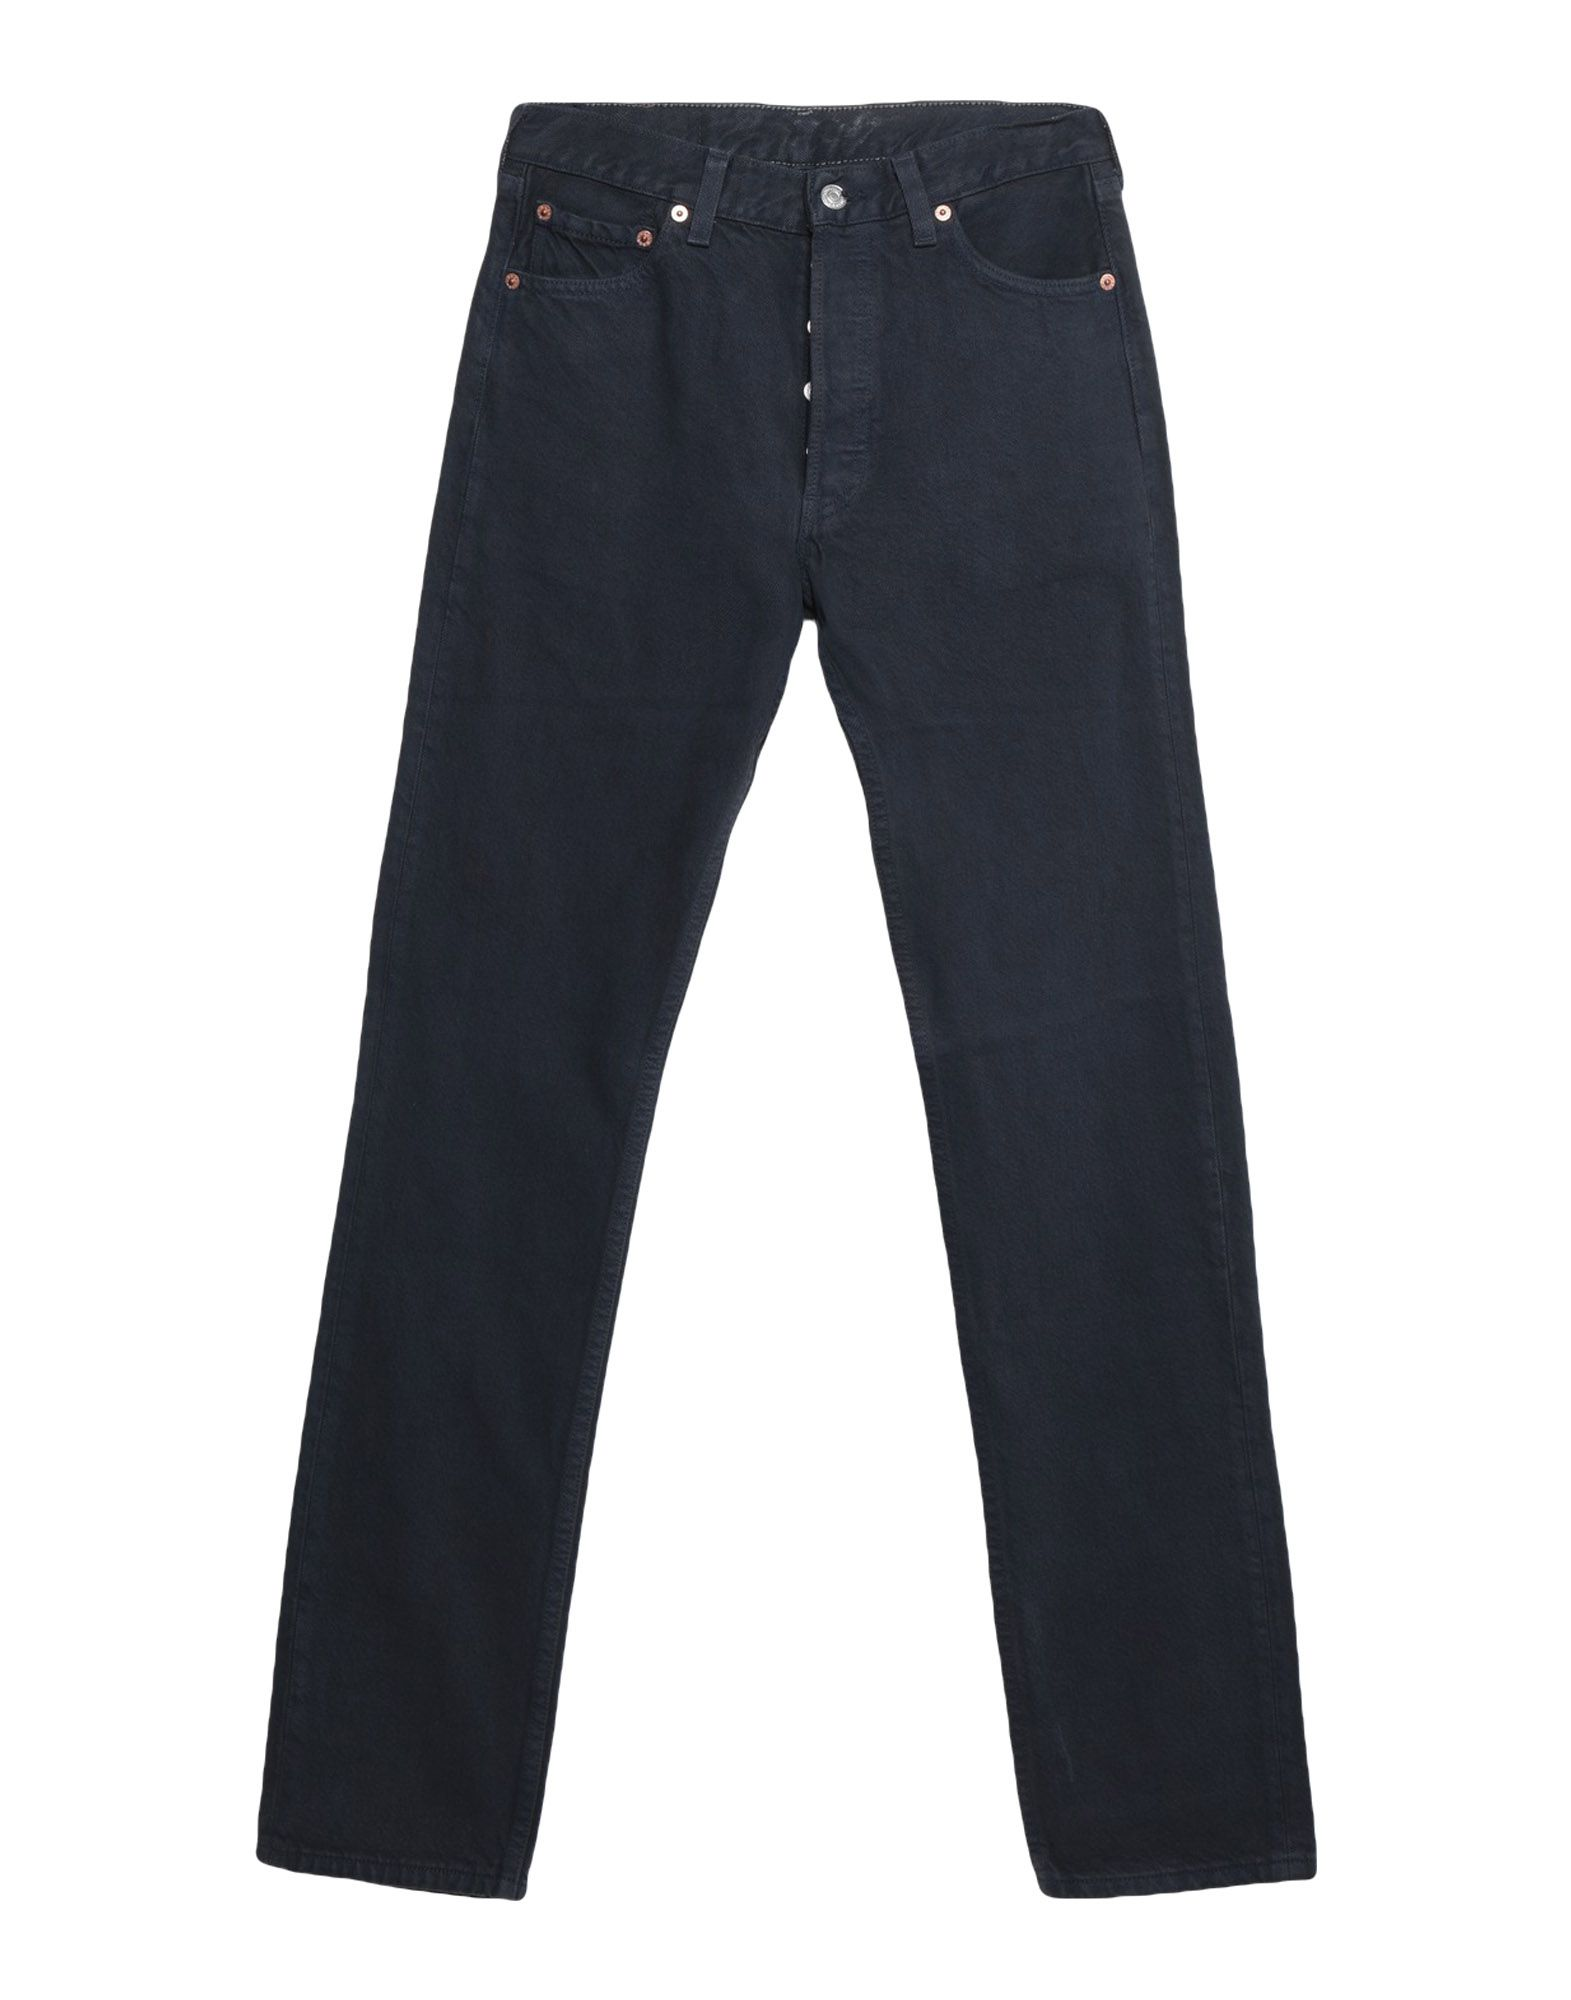 LEVI'S RED TAB Джинсовые брюки цена